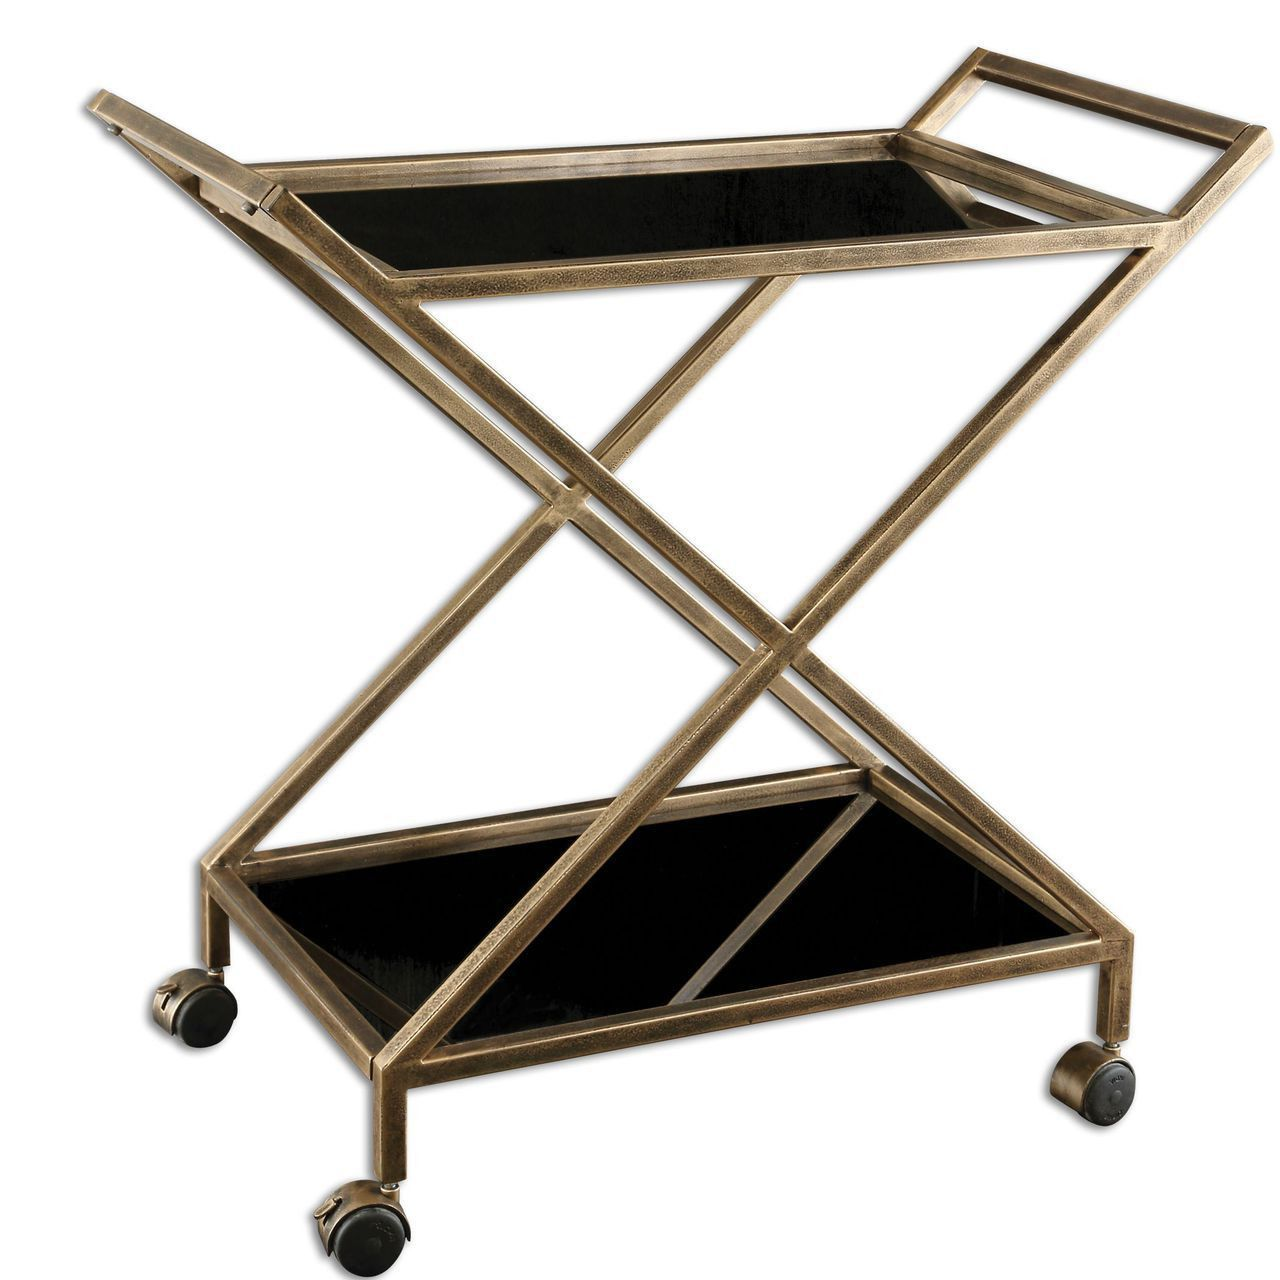 Uttermost Zafina Gold Bar Cart | Products | Pinterest | Gold bar ...